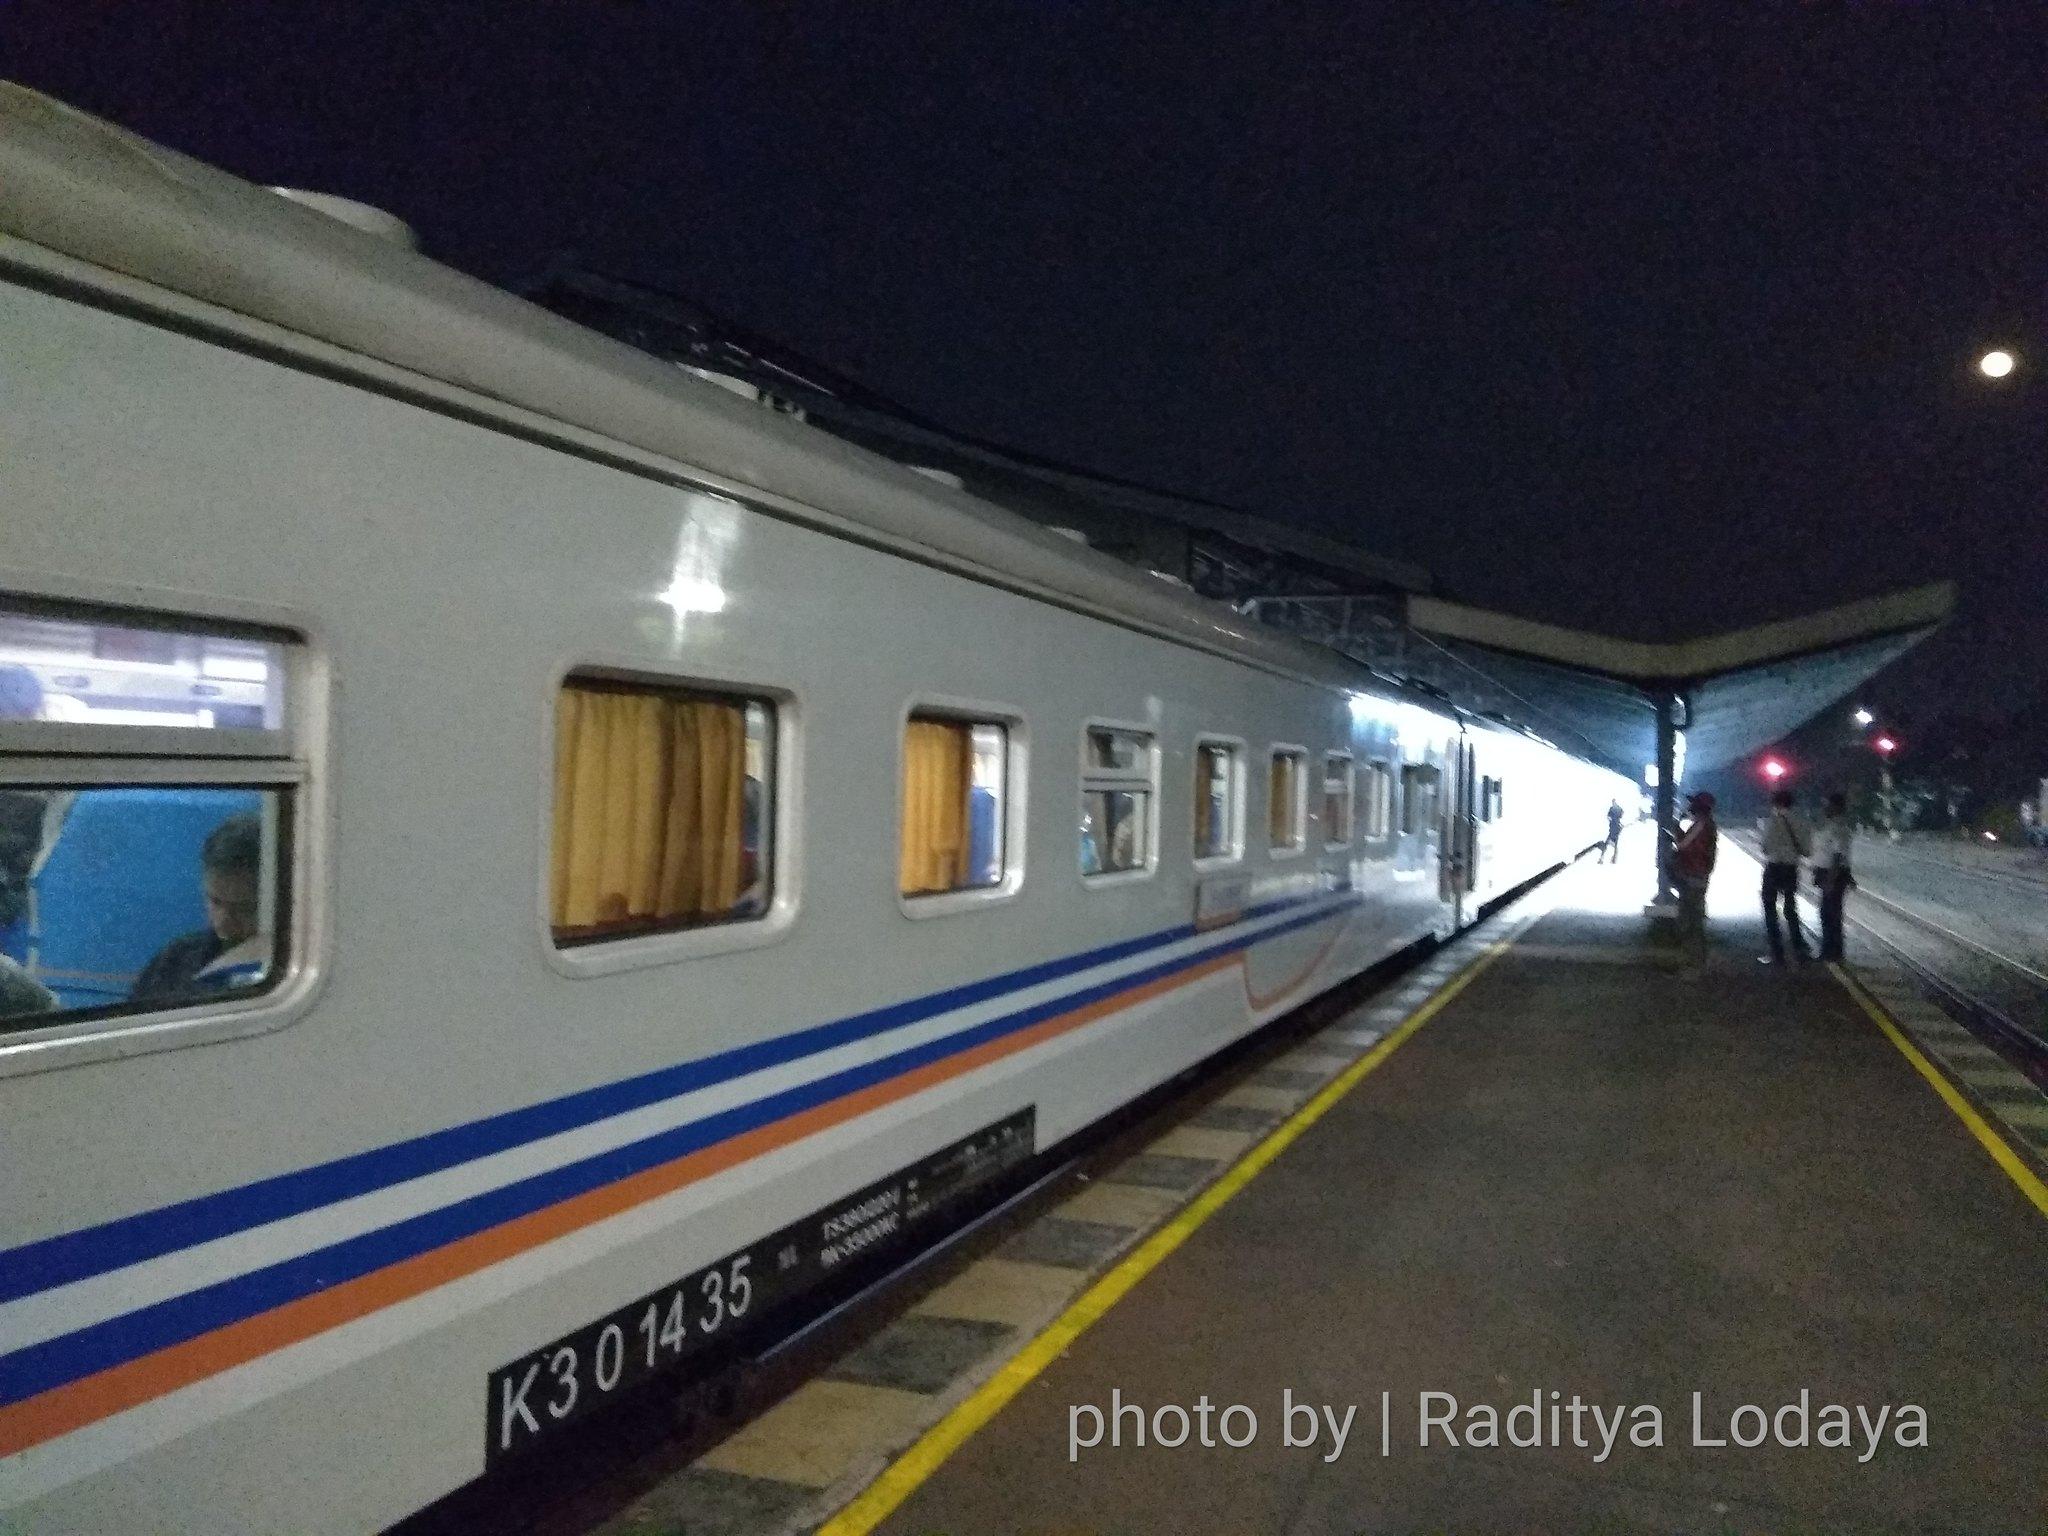 08 TRIP REPORT KERETA API JAYABAYA 3(TEGAL CEPU) - STASIUN WELERI 1